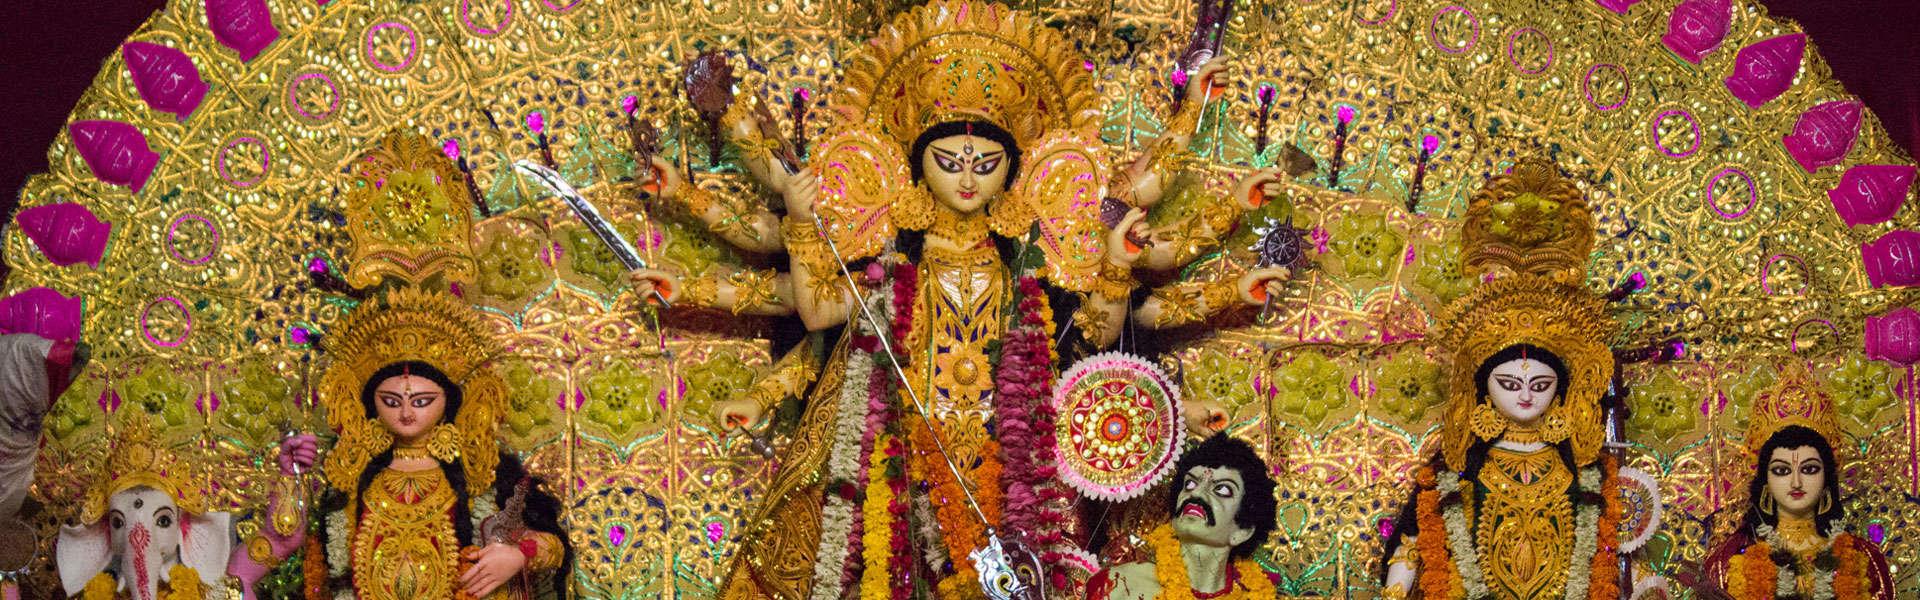 Navi Mumbai's Best Durga Pujas 2016